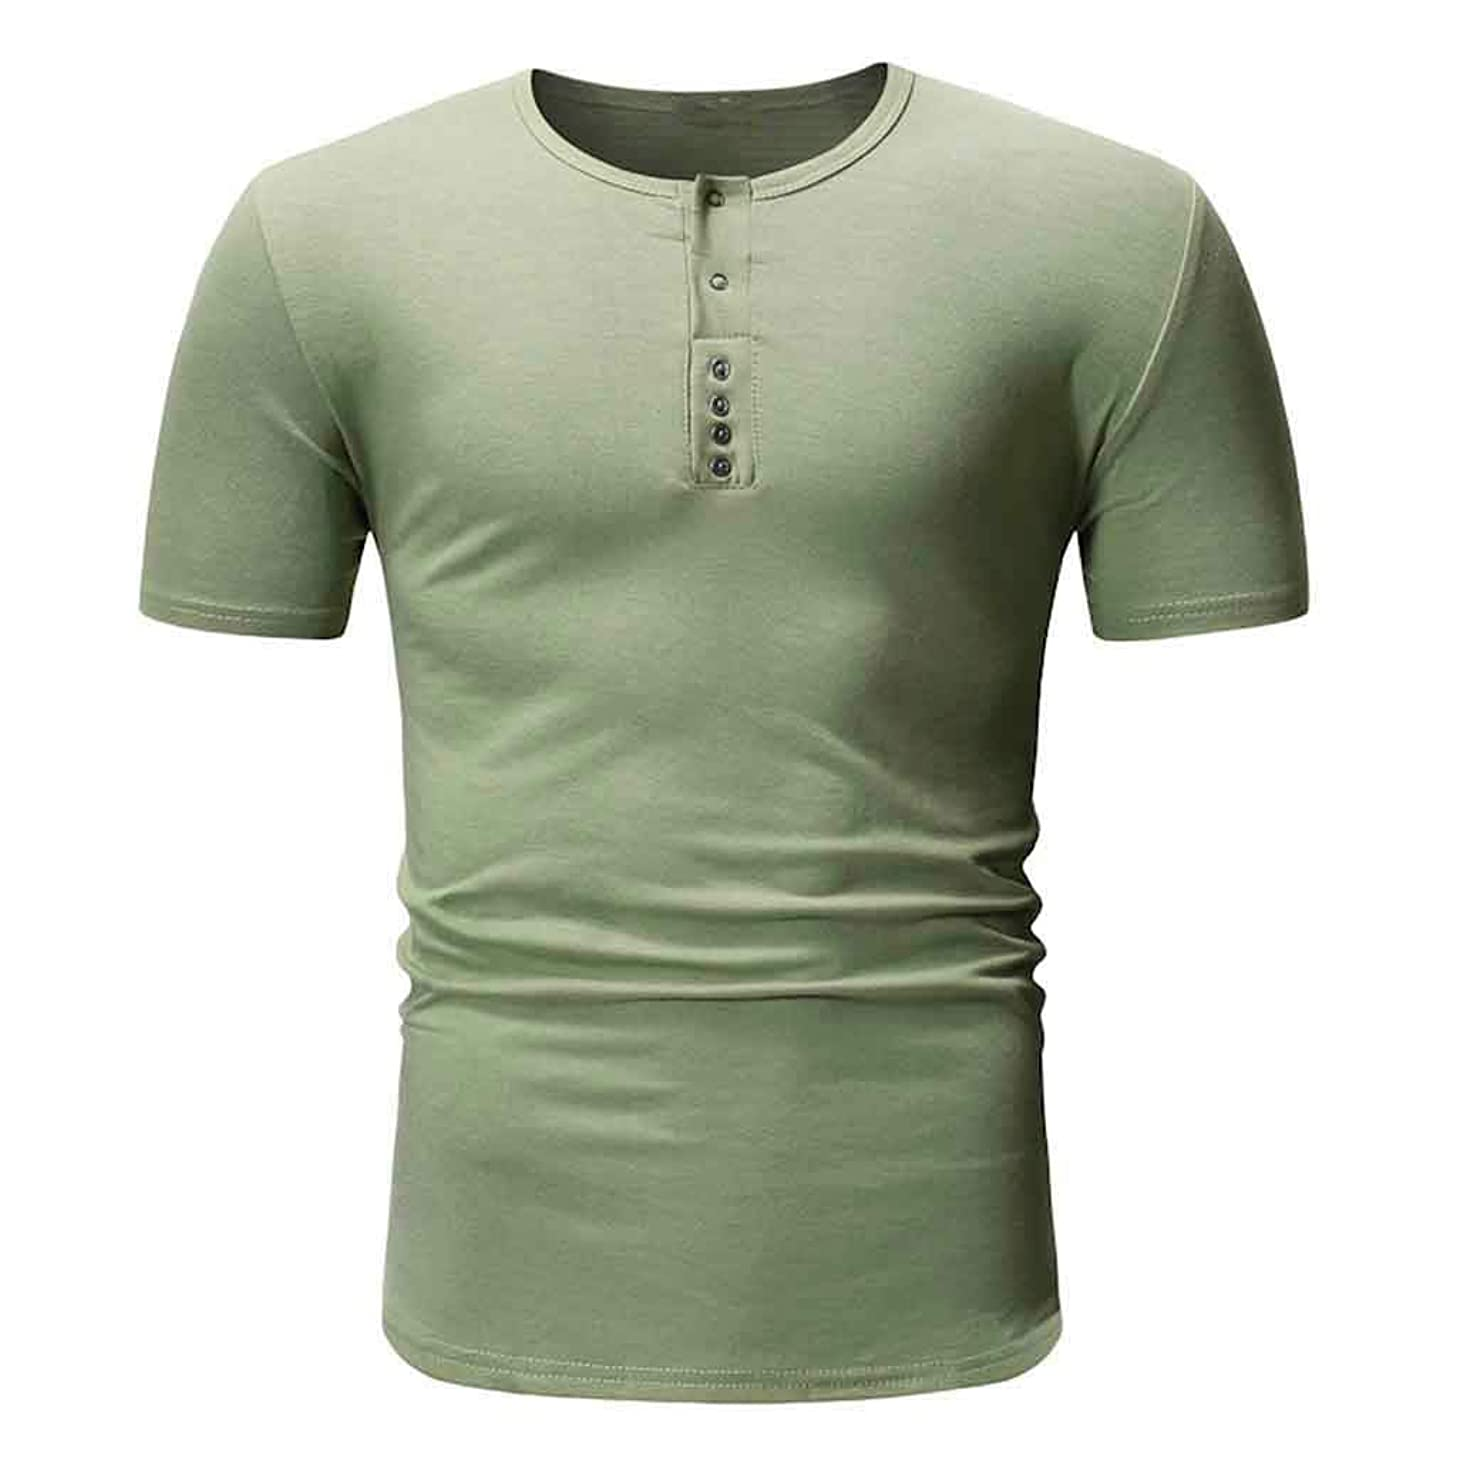 Mens Summer t Shirts Short Sleeve,Tronet Men Summer Fashion Short Sleeve T-Shirt Cotton Solid Tee Casual Top Blouse